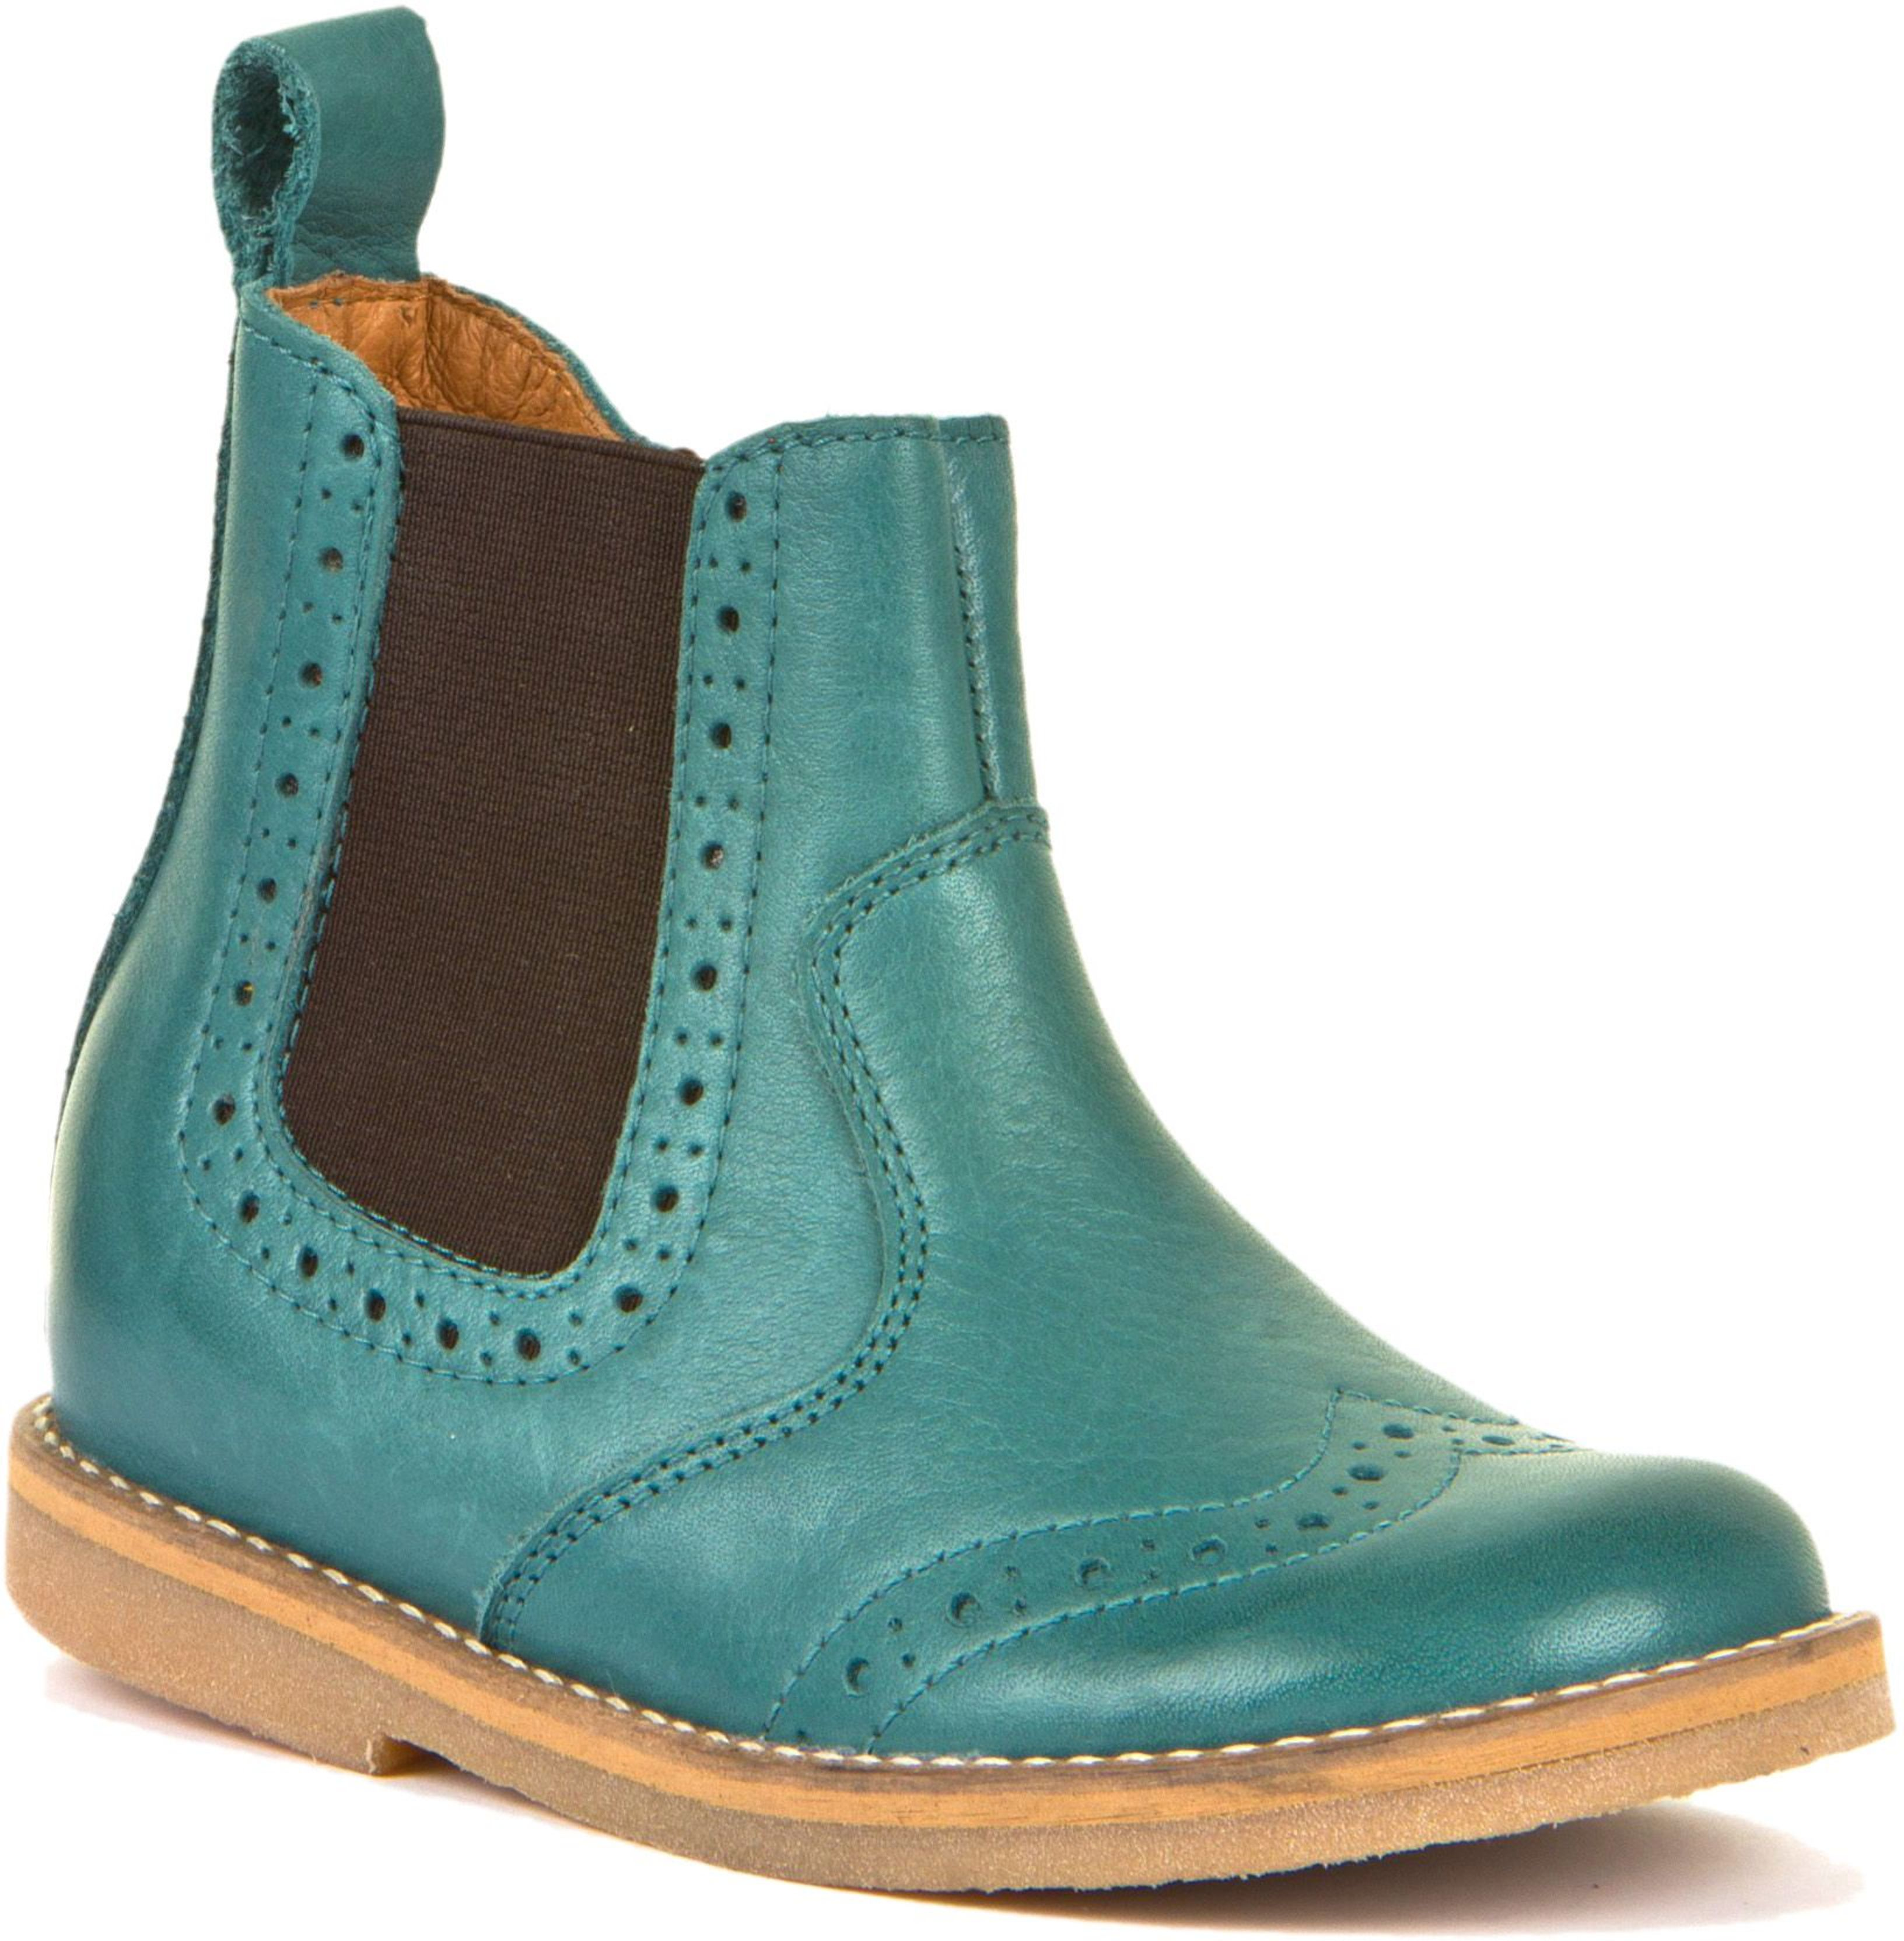 Froddo Chelsea Boots Brogue Petroleum